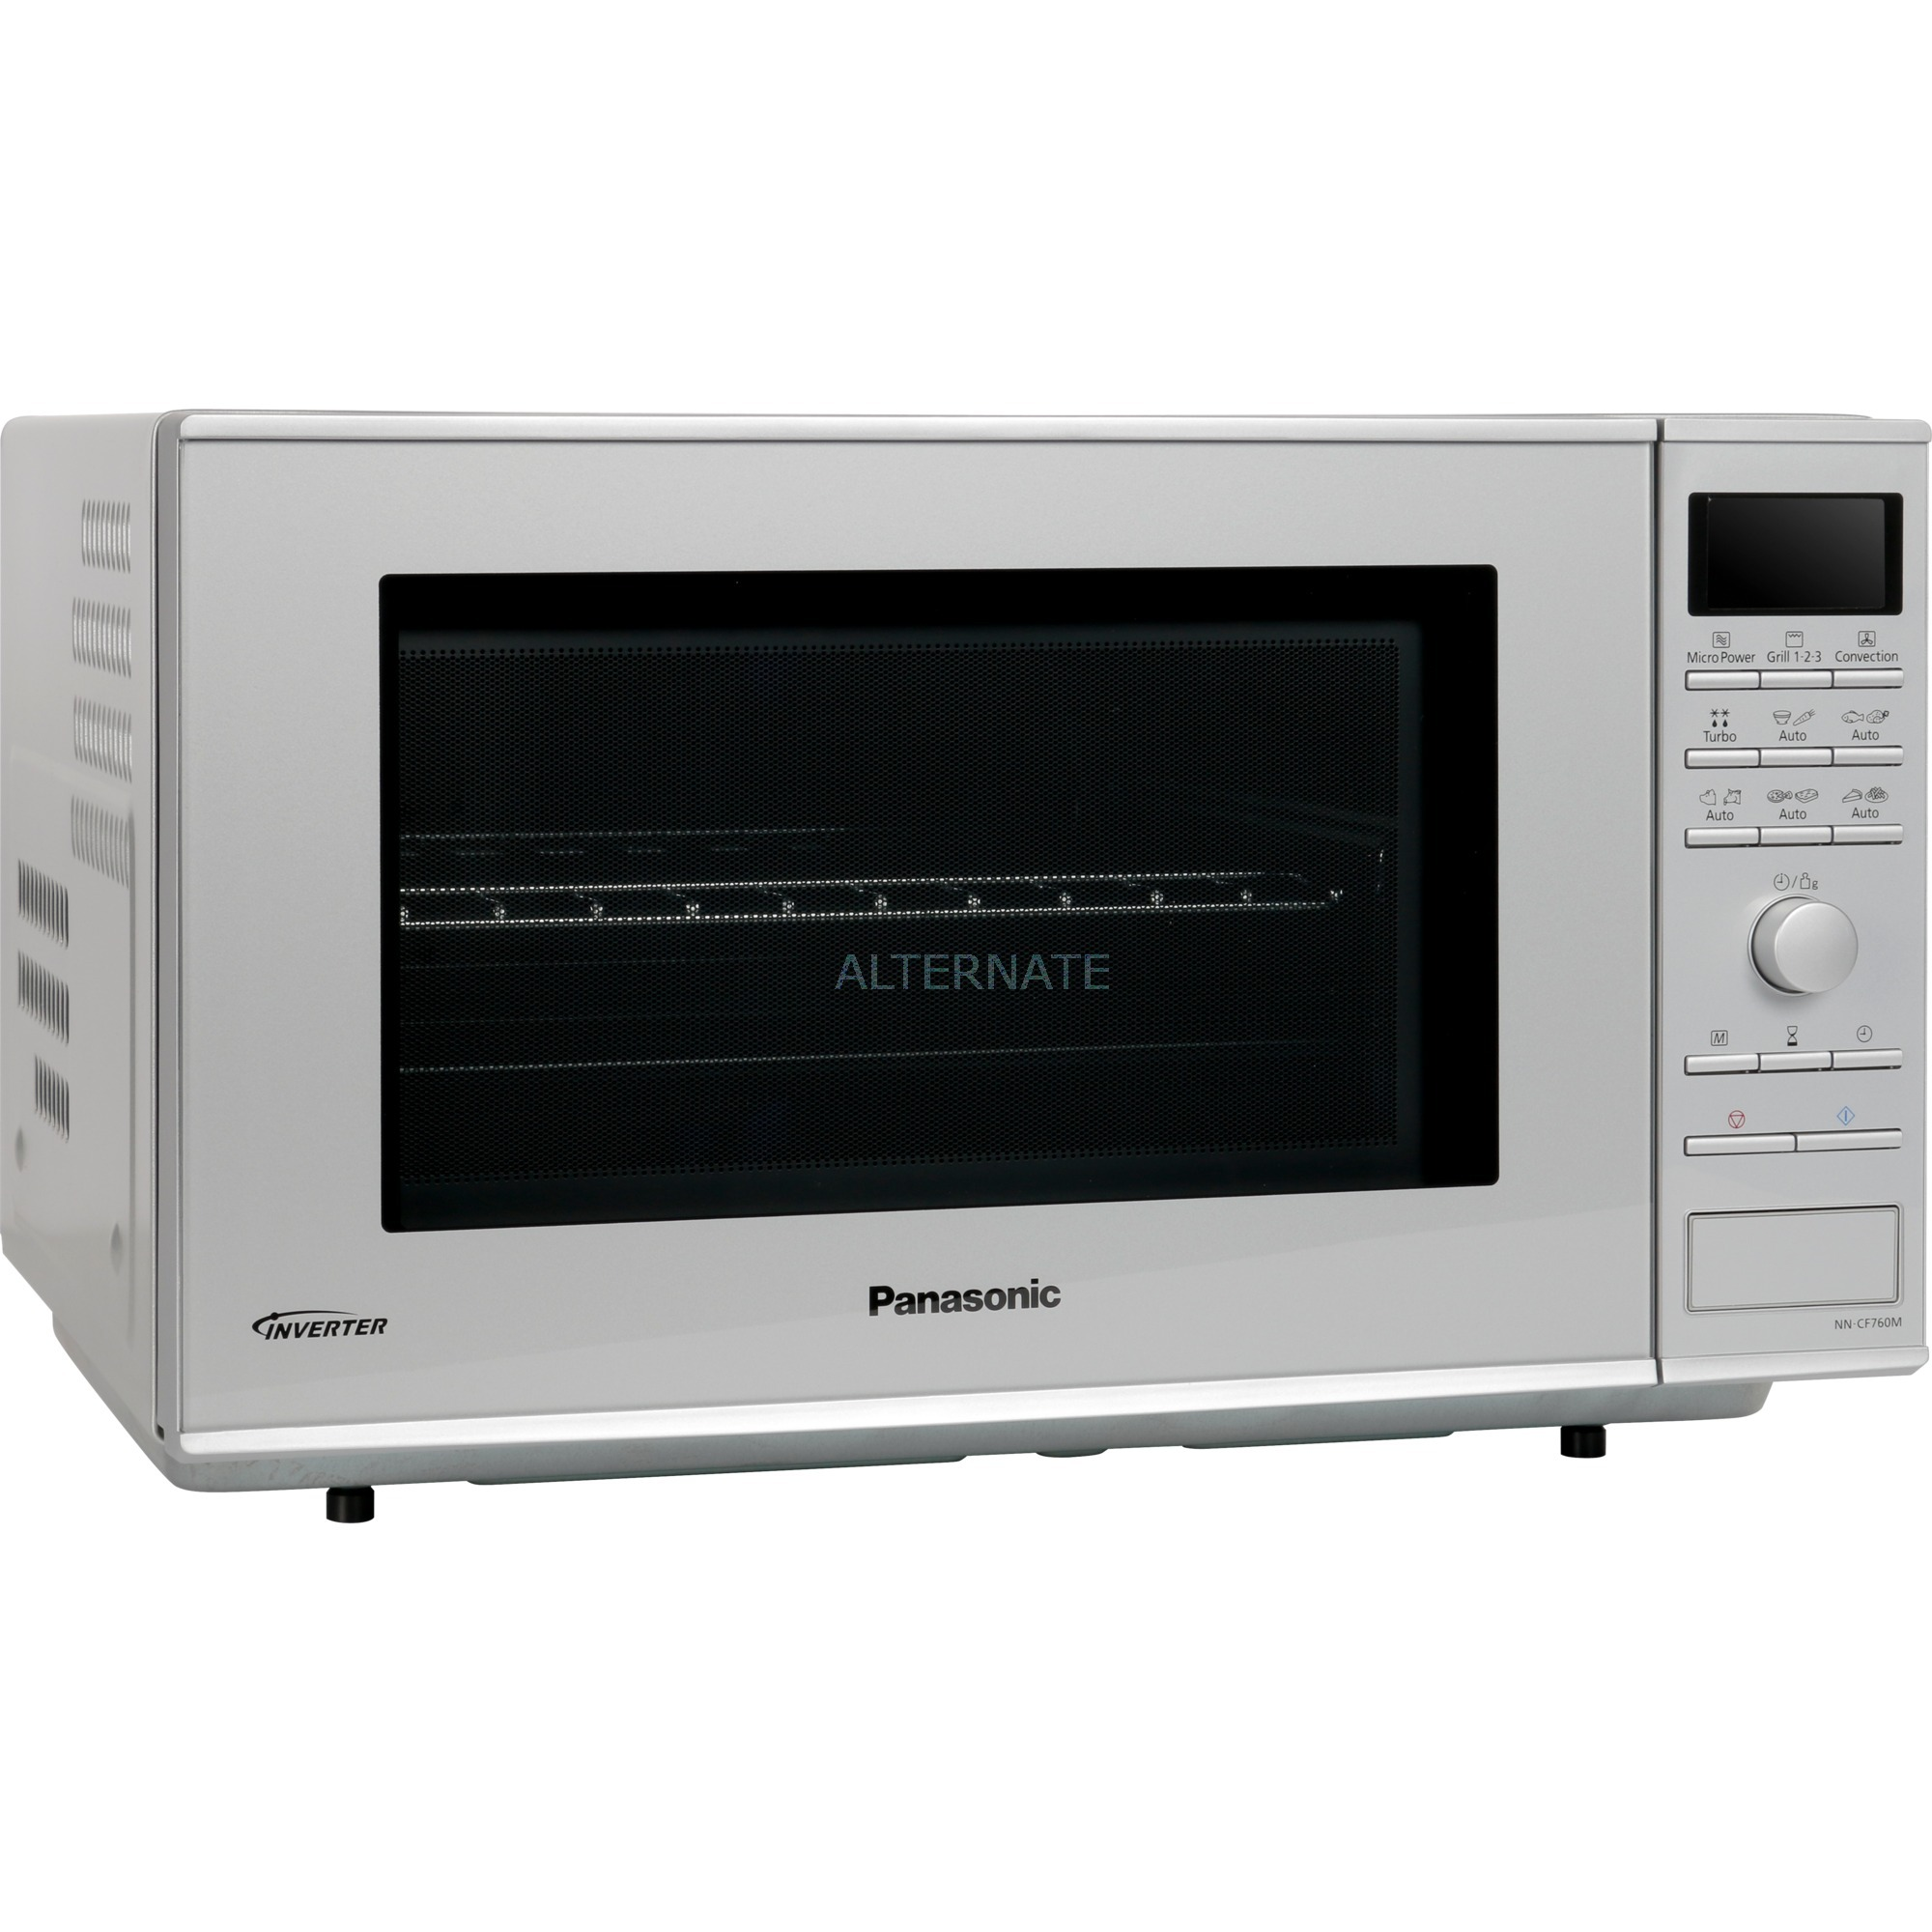 NN-CF760M 27L 1000W Acier inoxydable, Four à micro-ondes